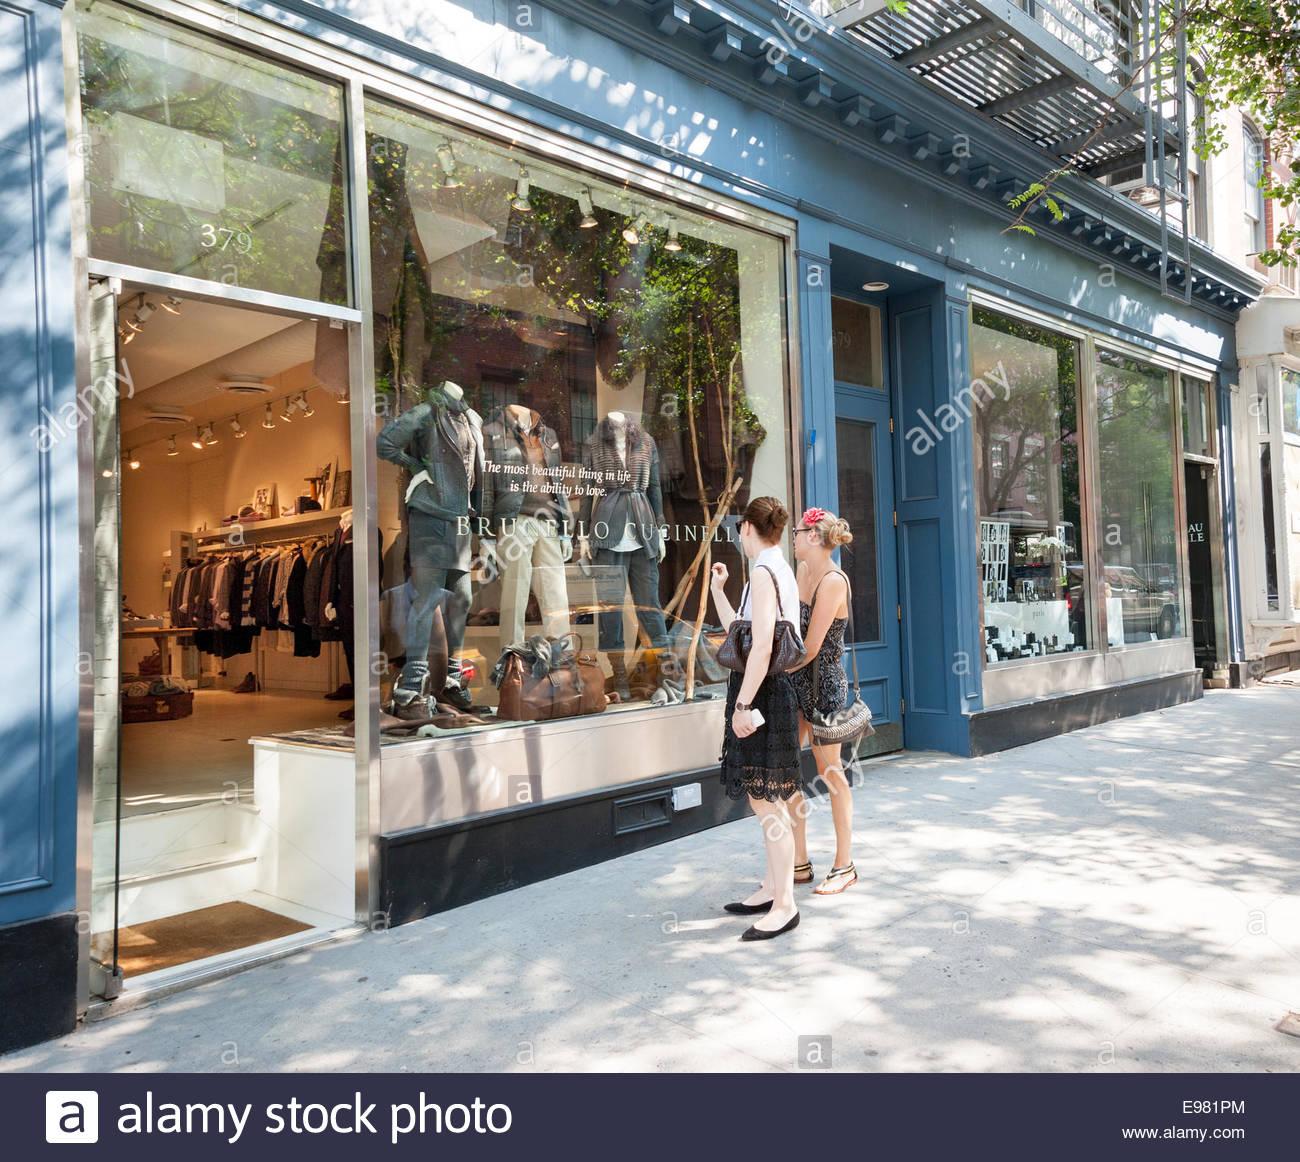 Young women window shopping in Bleecker Street, Greenwich Village, New York City, USA - Stock Image